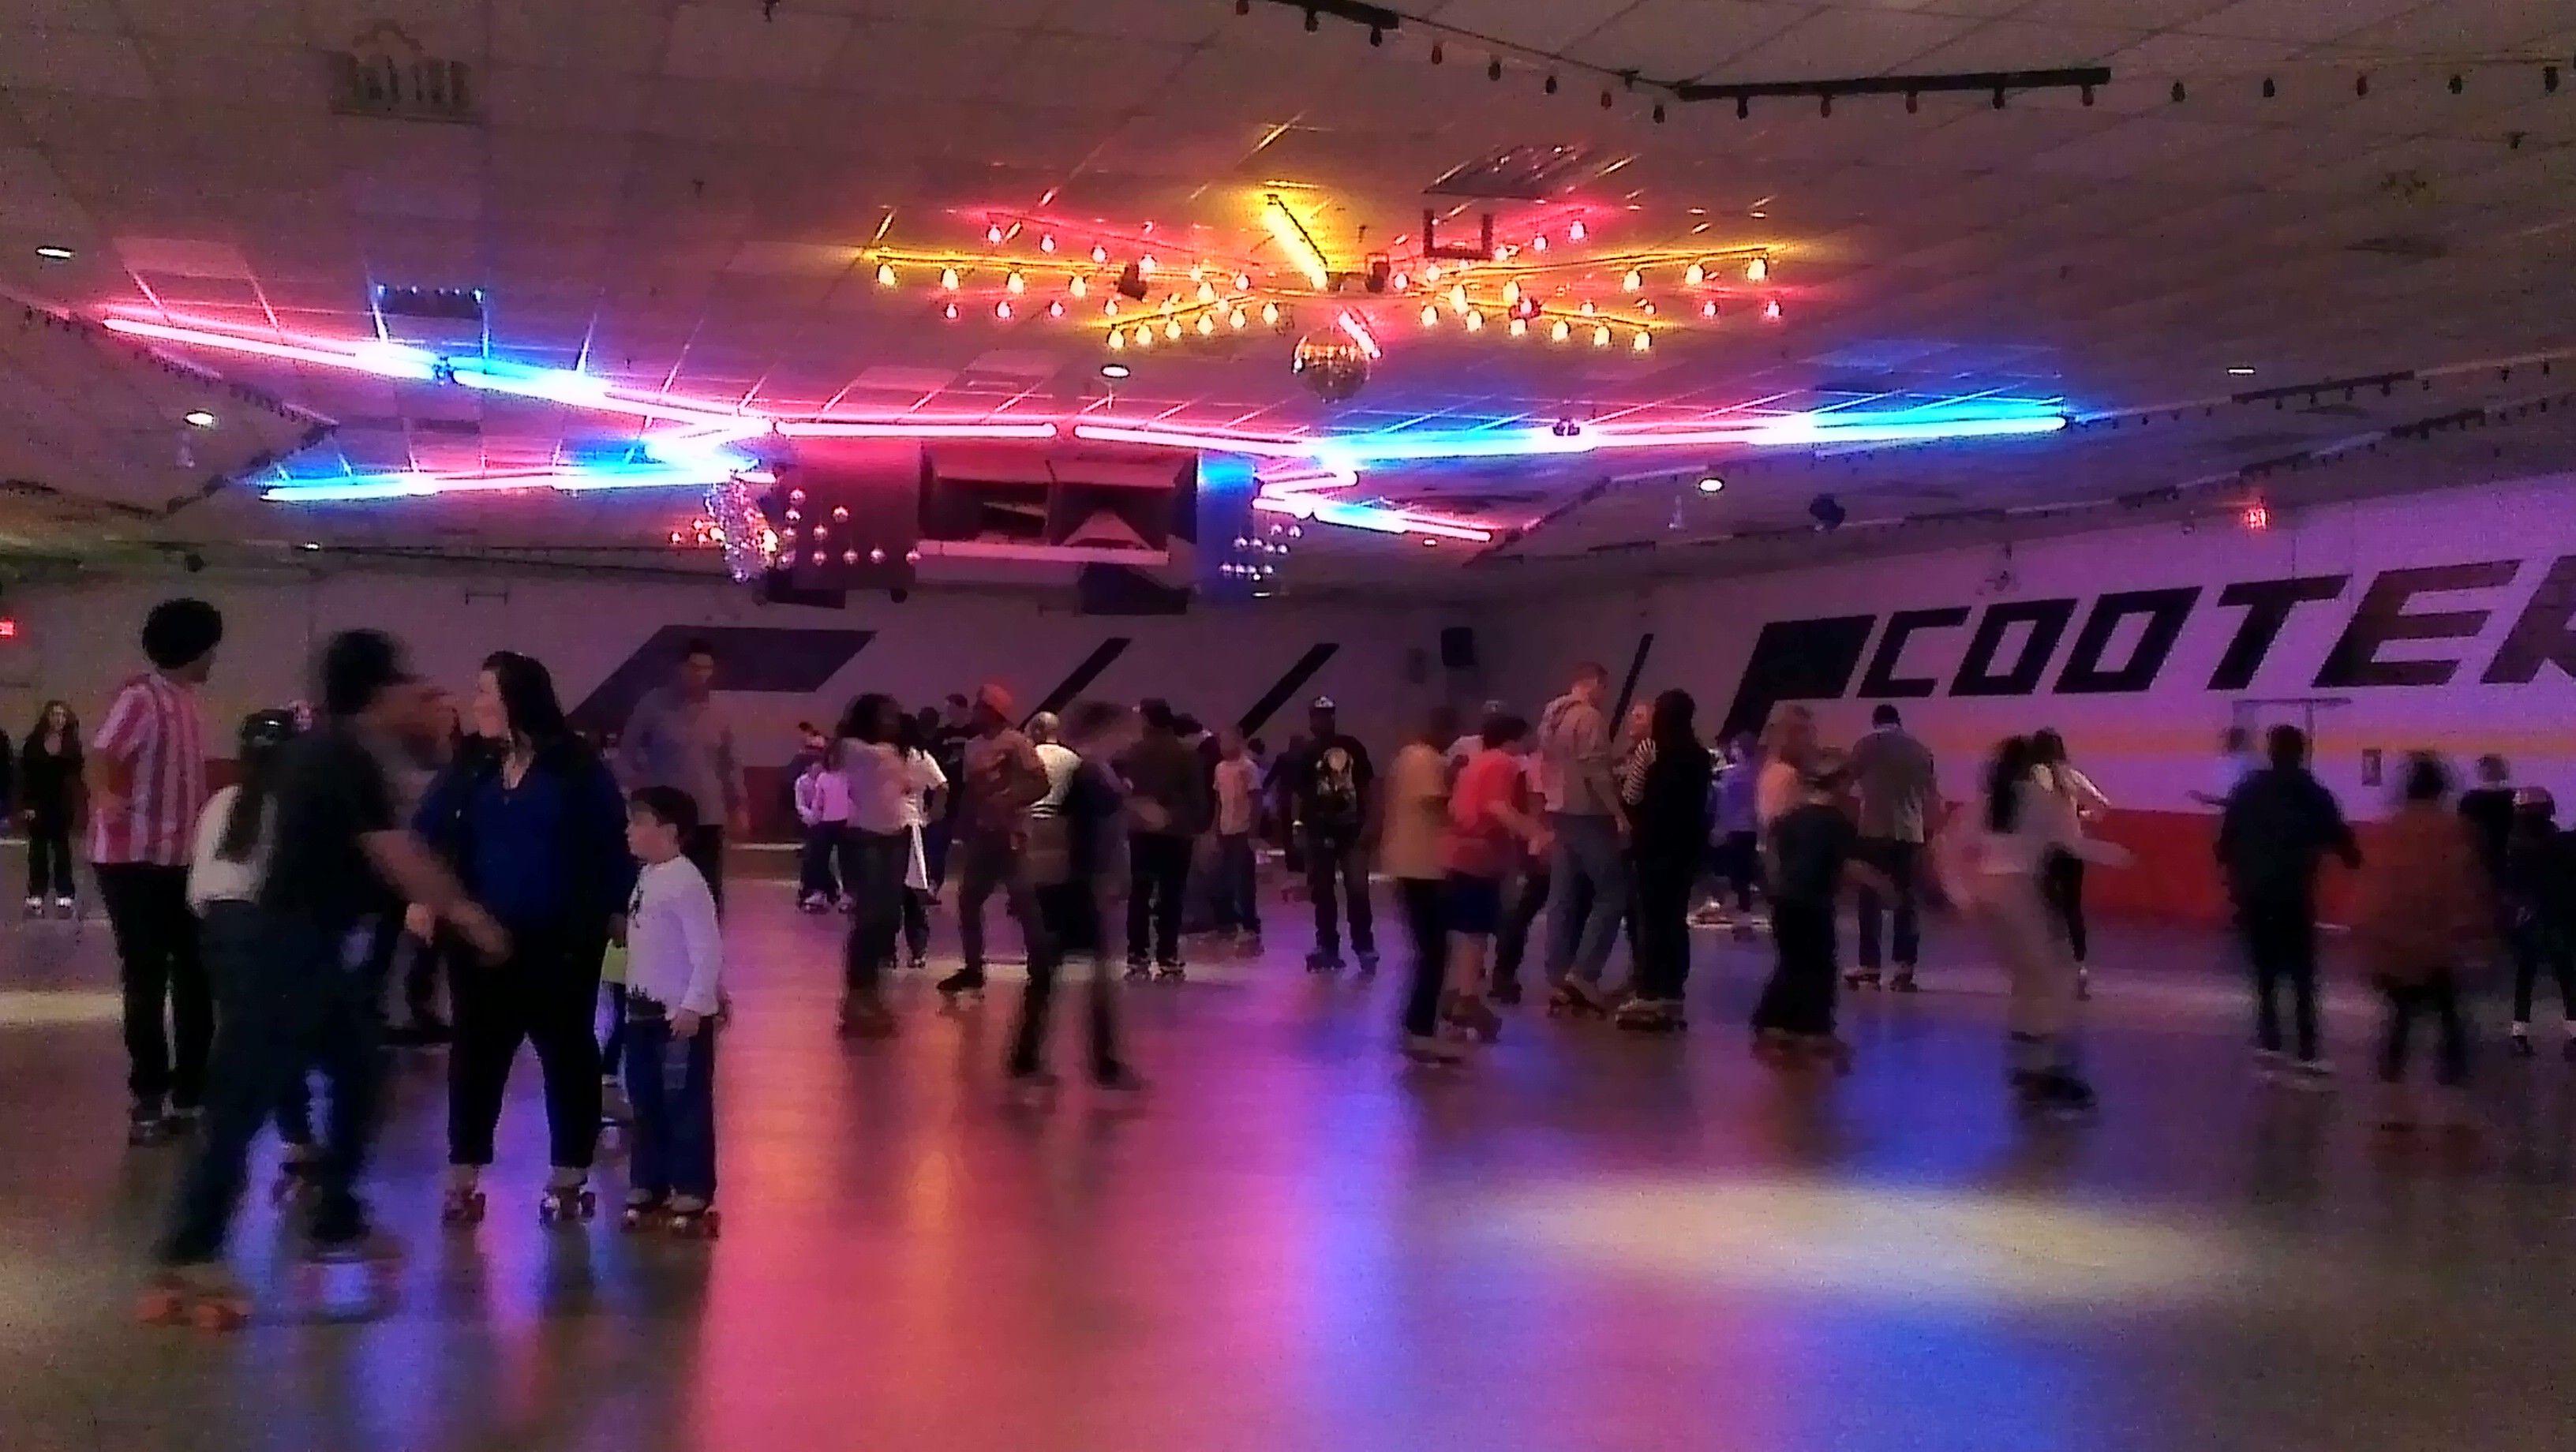 Roller skating rink canberra - Roller Skating Rinks York Region Scooter S Roller Palace Mississauga Ontario